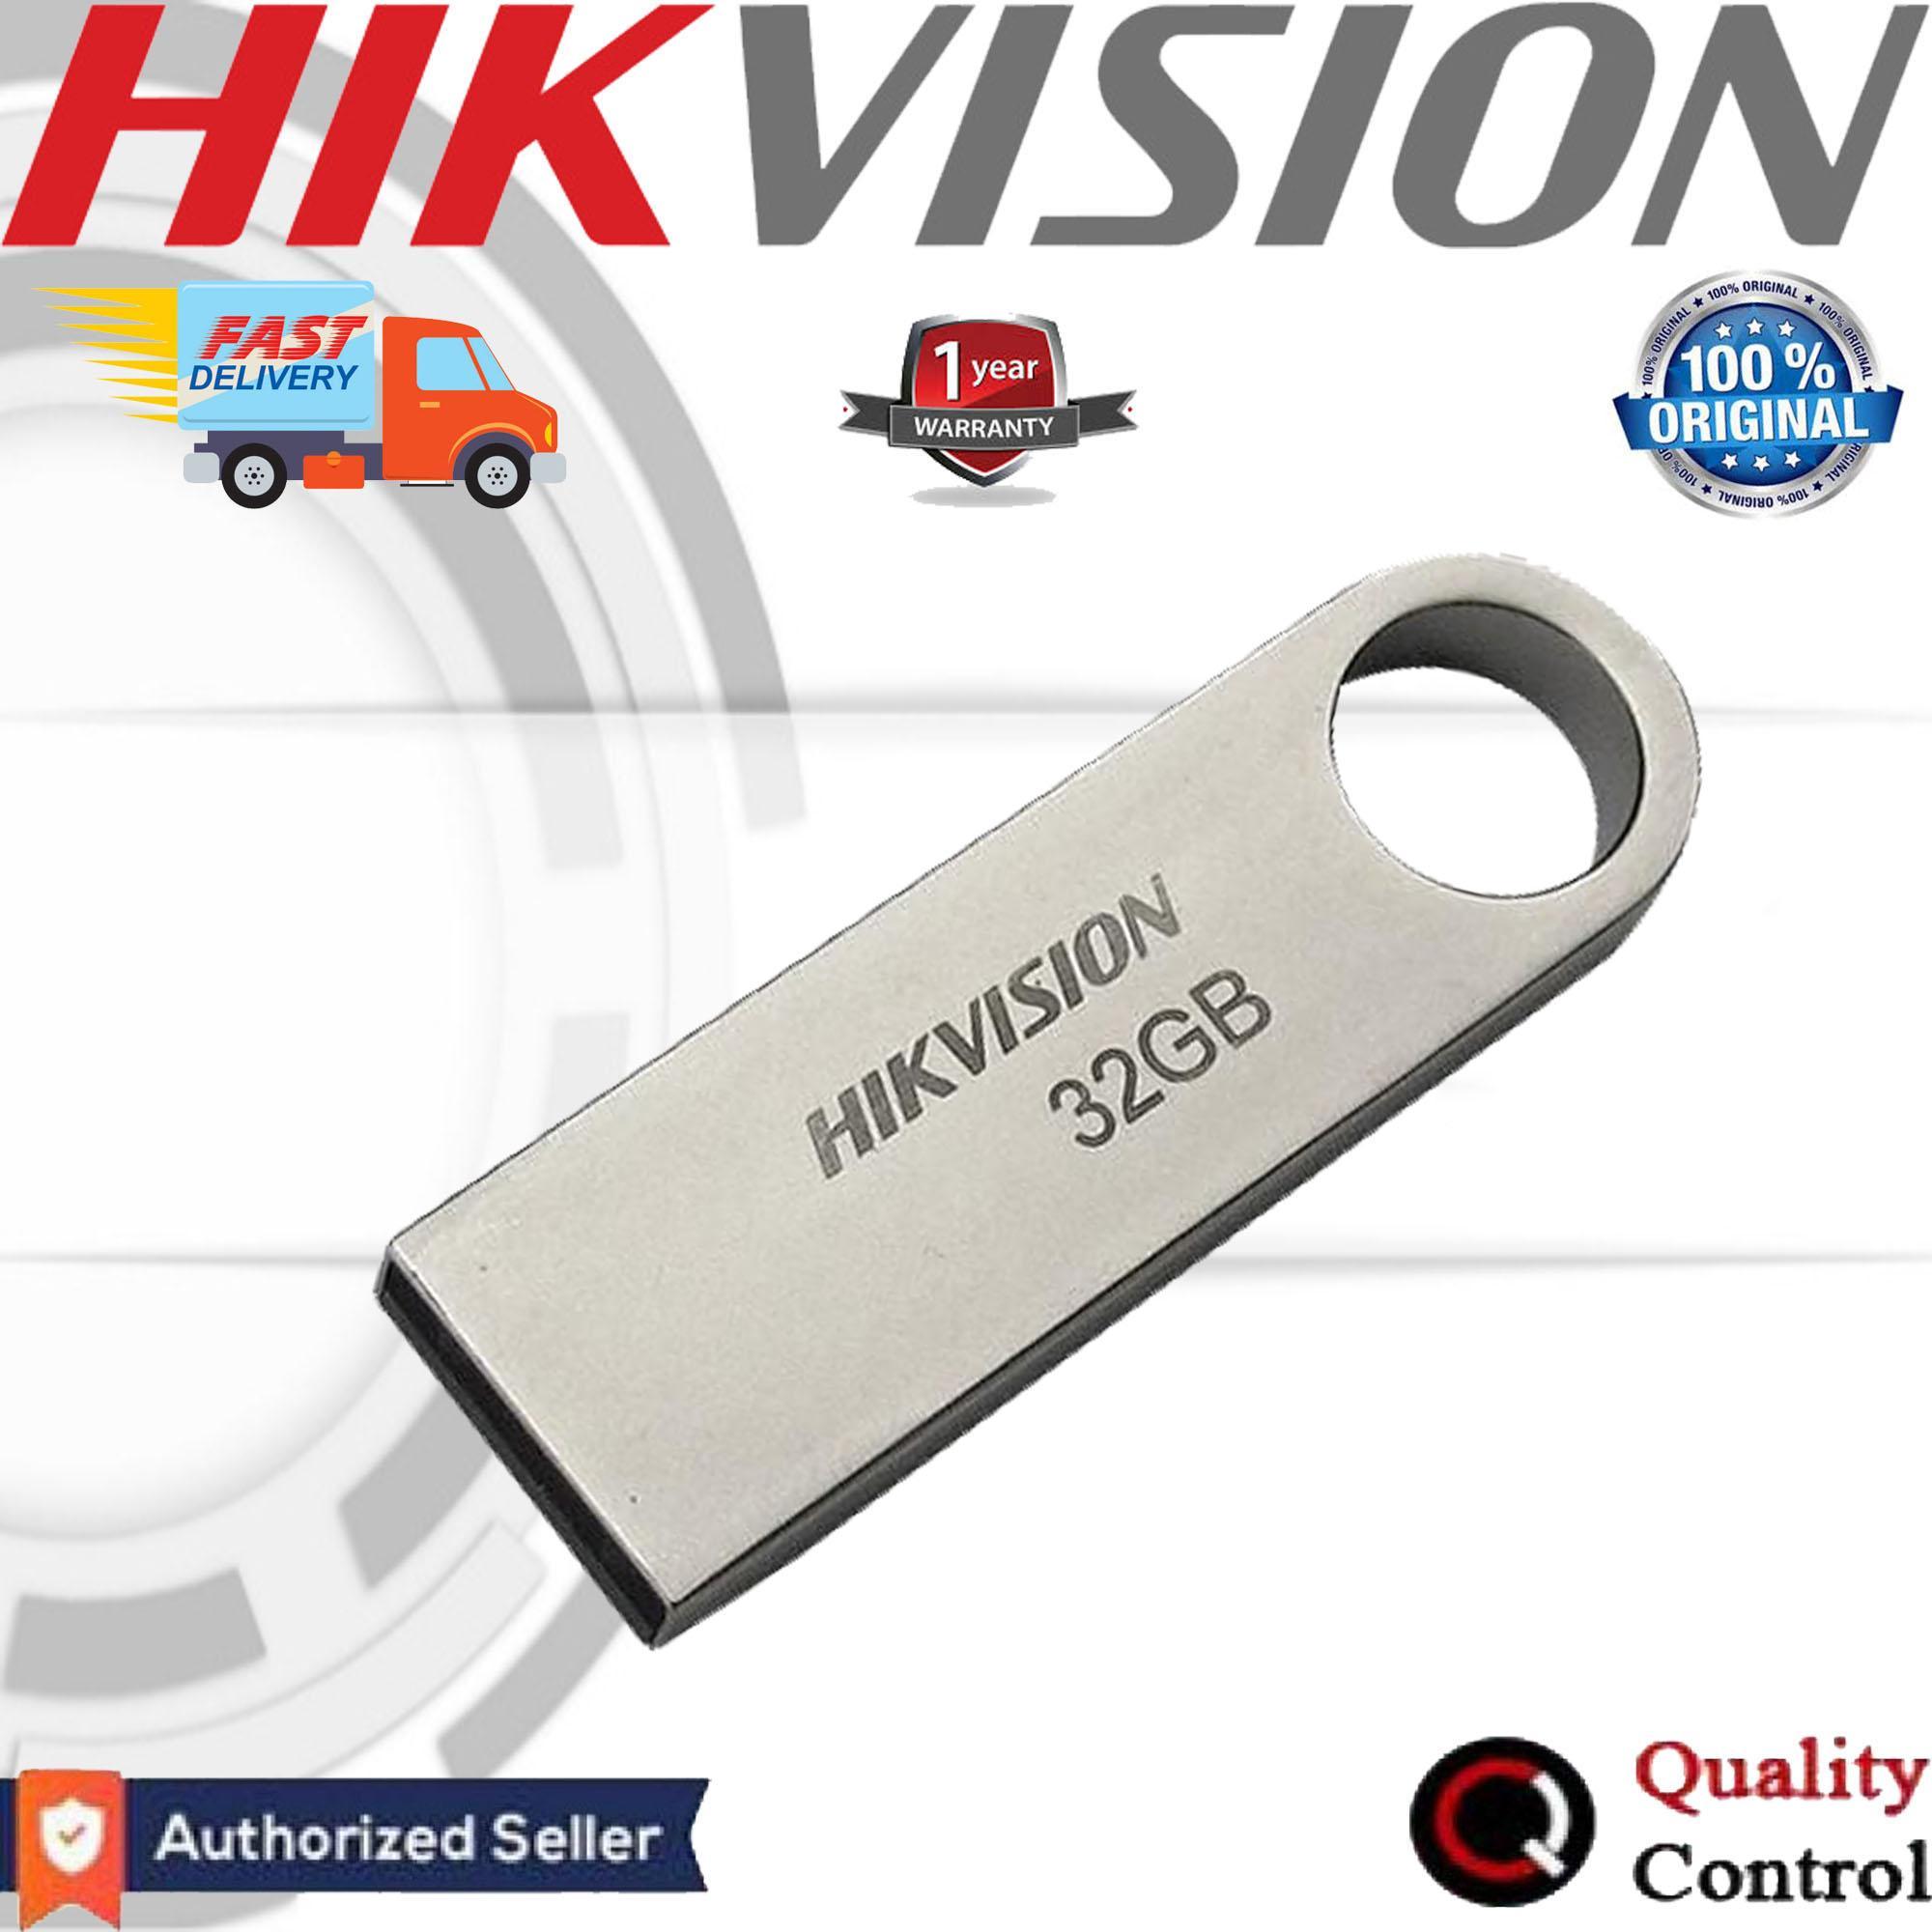 Hikvision Philippines: Hikvision price list - Hikvision CCTV